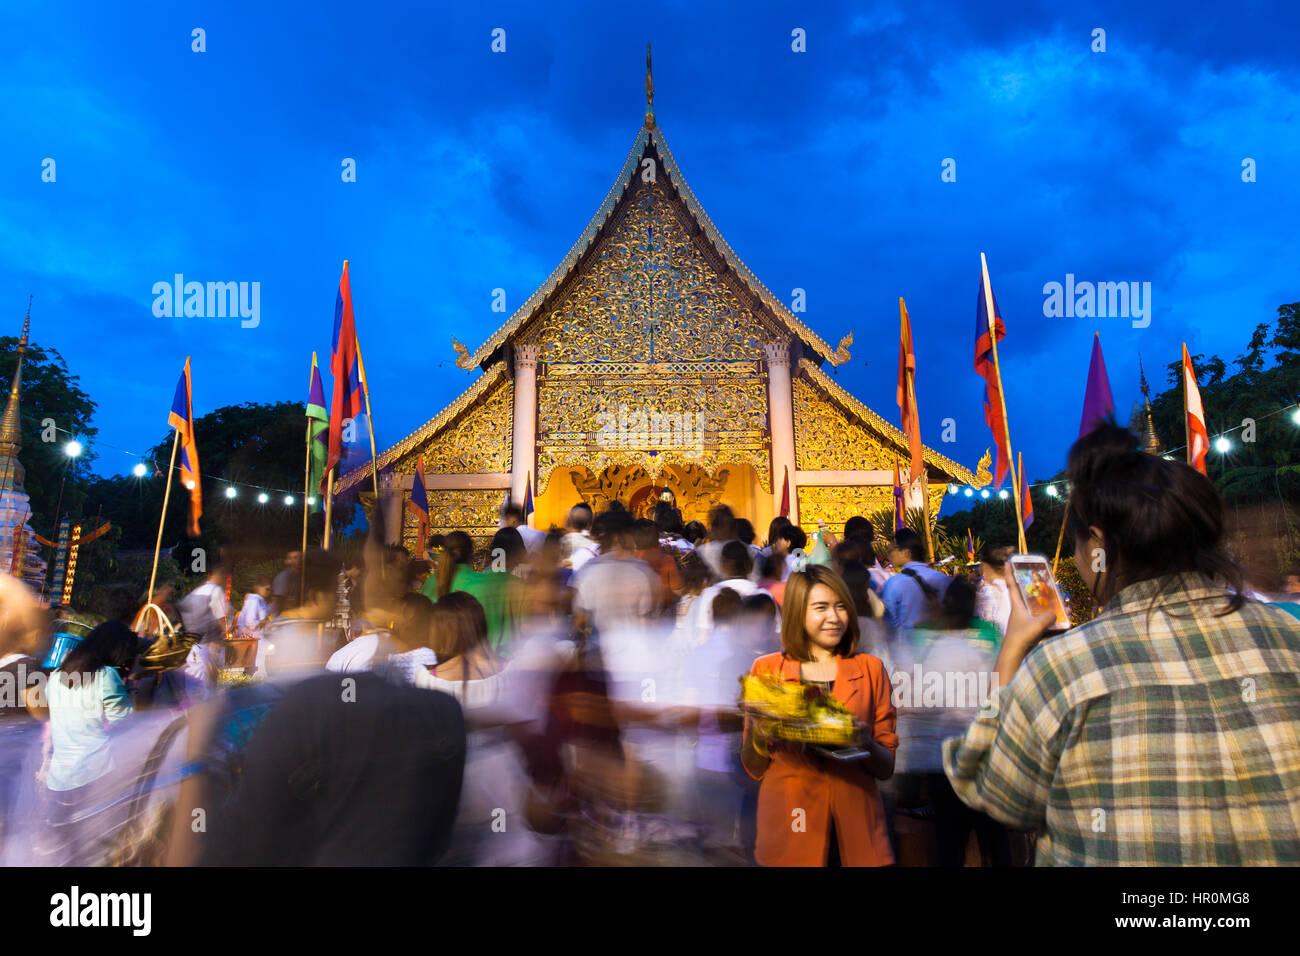 Chiang Mai, Thailand - 29. Mai 2014: Menschenmenge beim Stadtfest Säule (Inthakin Festival) im Wat Chedi Luang Stockbild